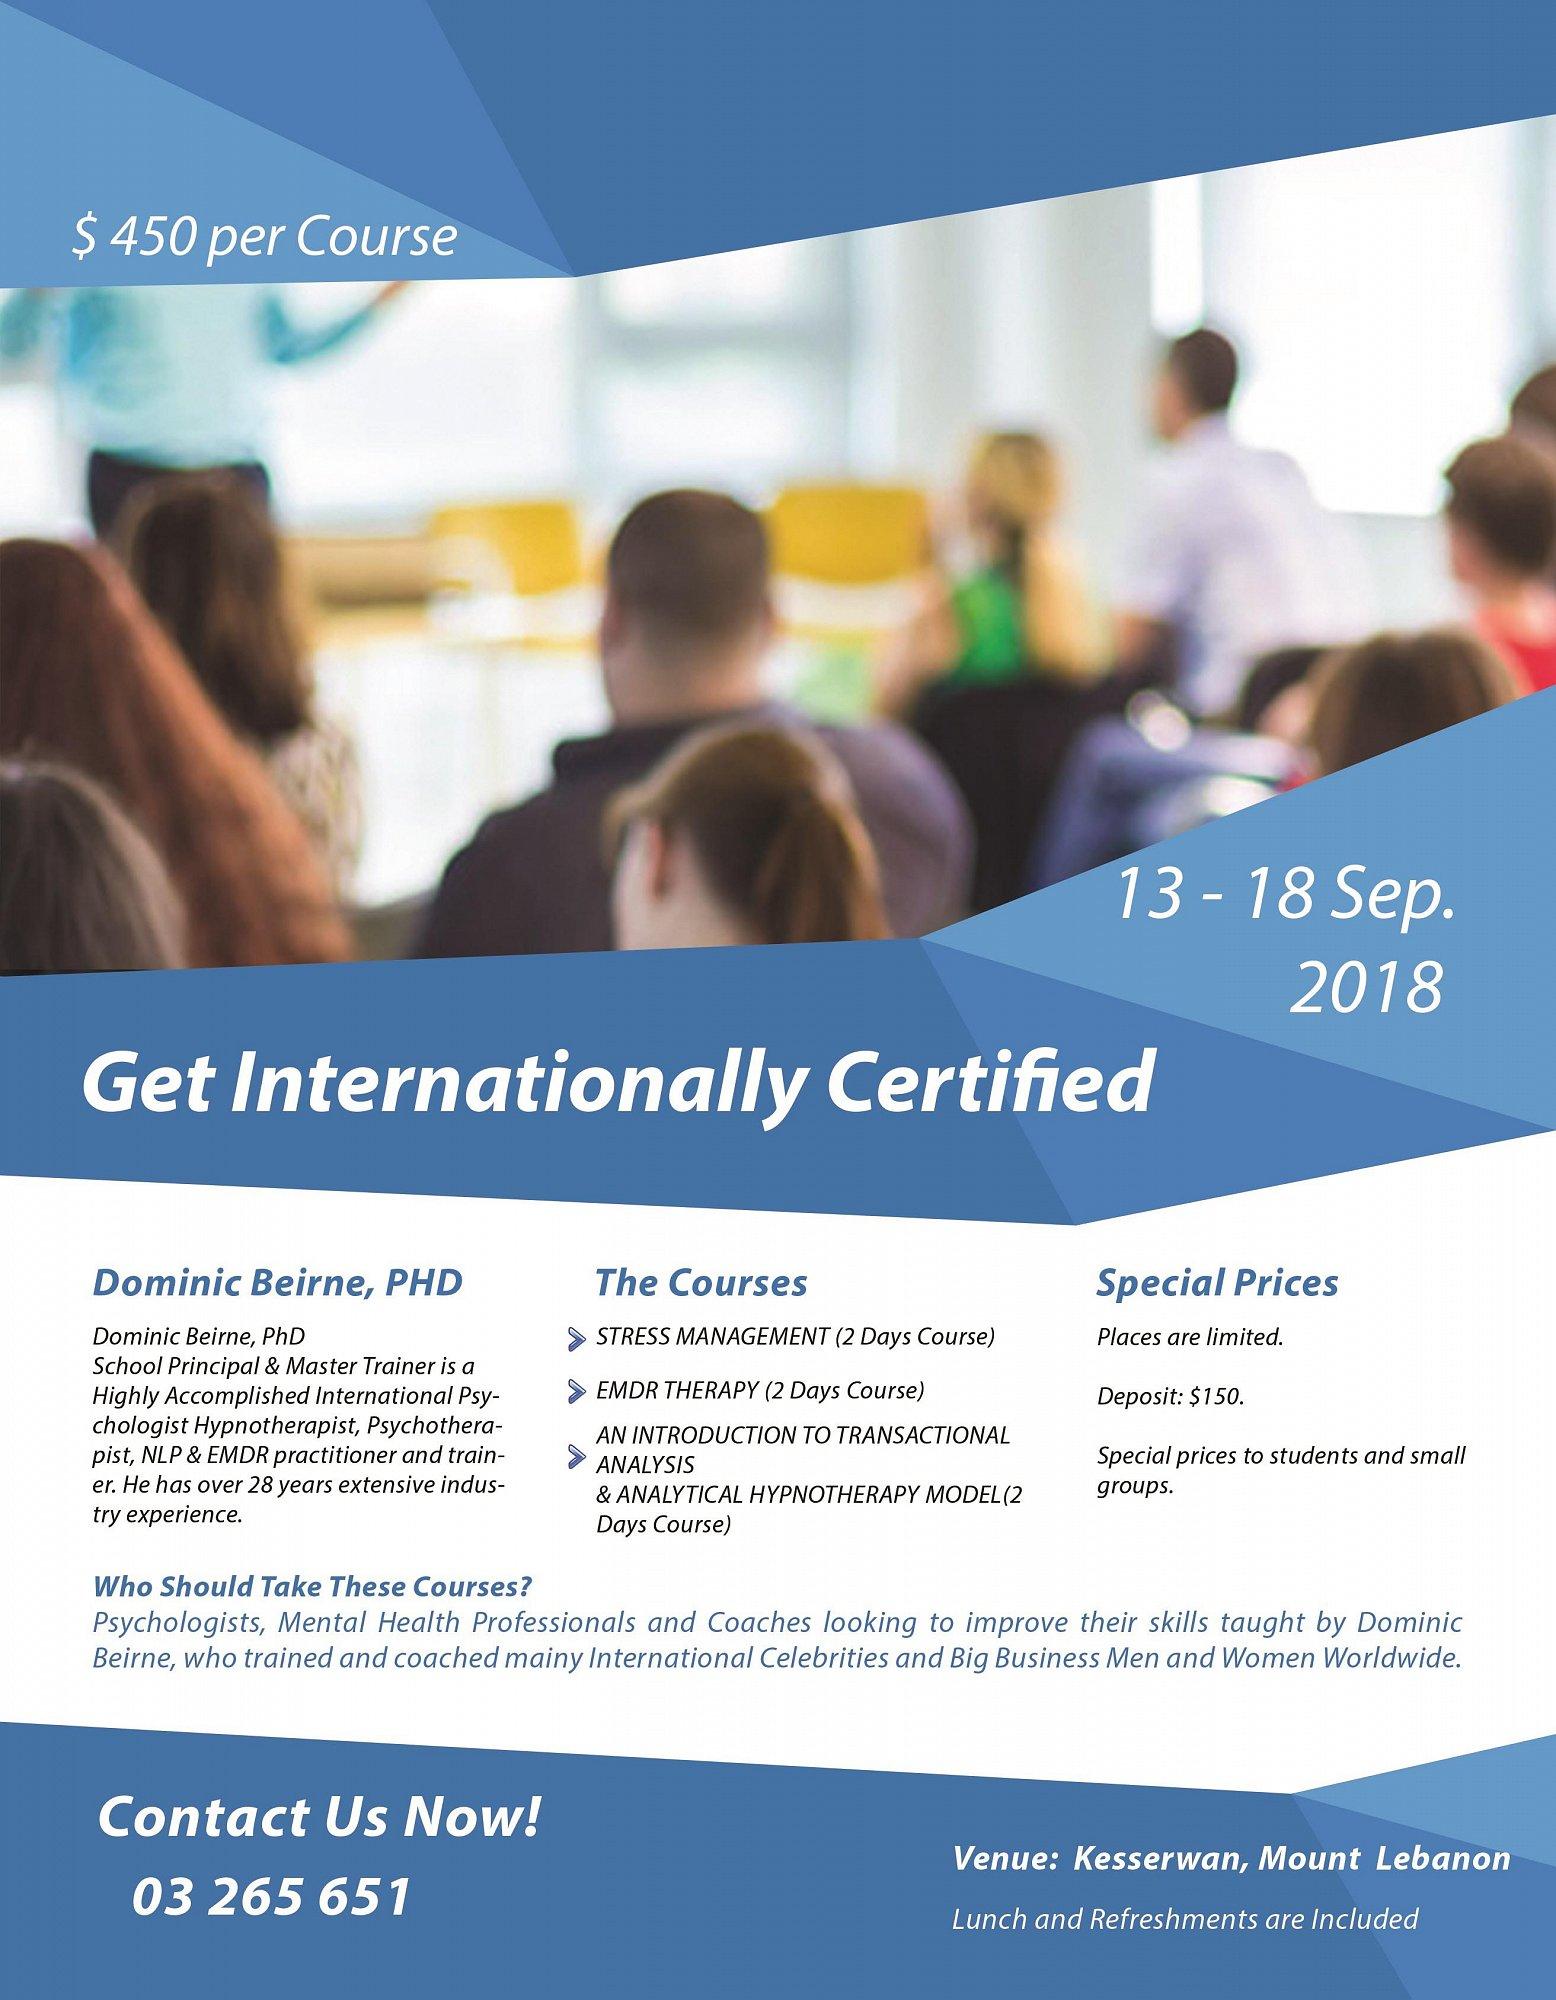 Get Internationally Certified For Psychologistsmental Health